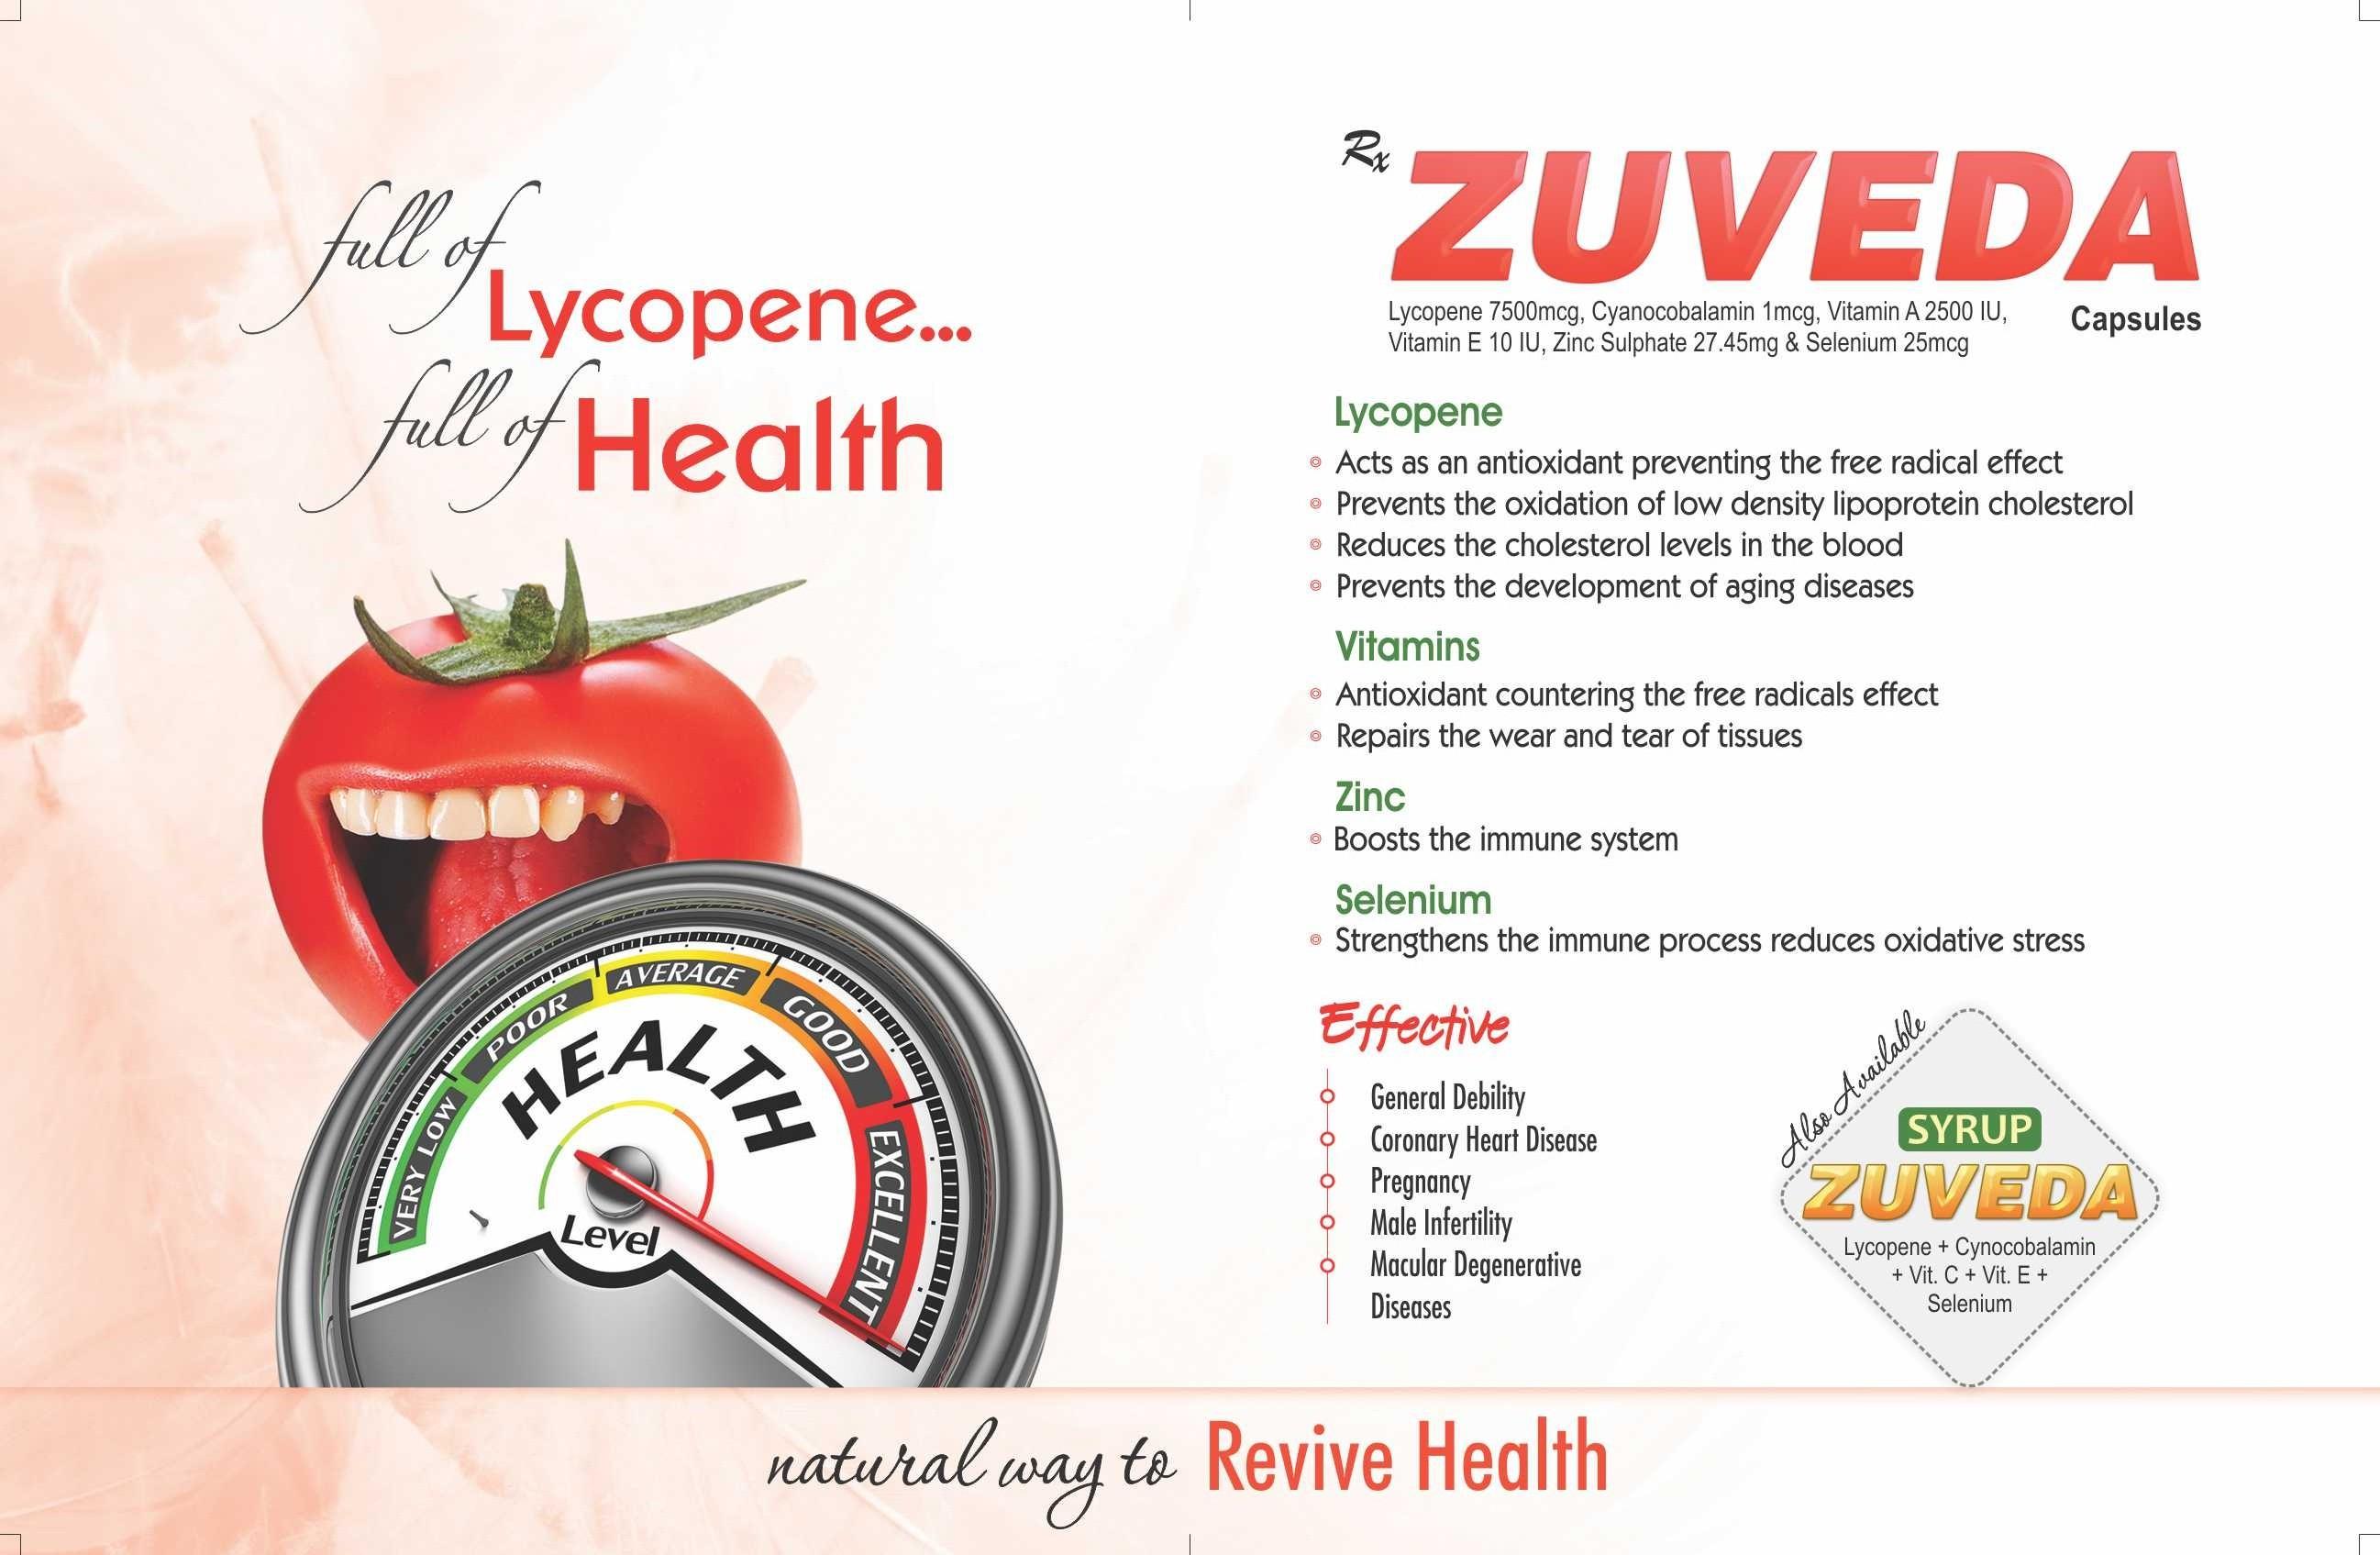 Zuveda